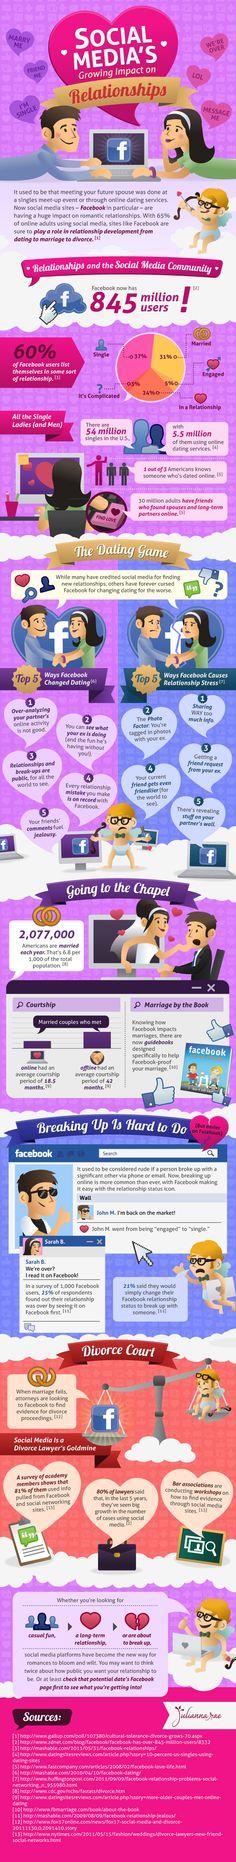 social-media-dating-impact